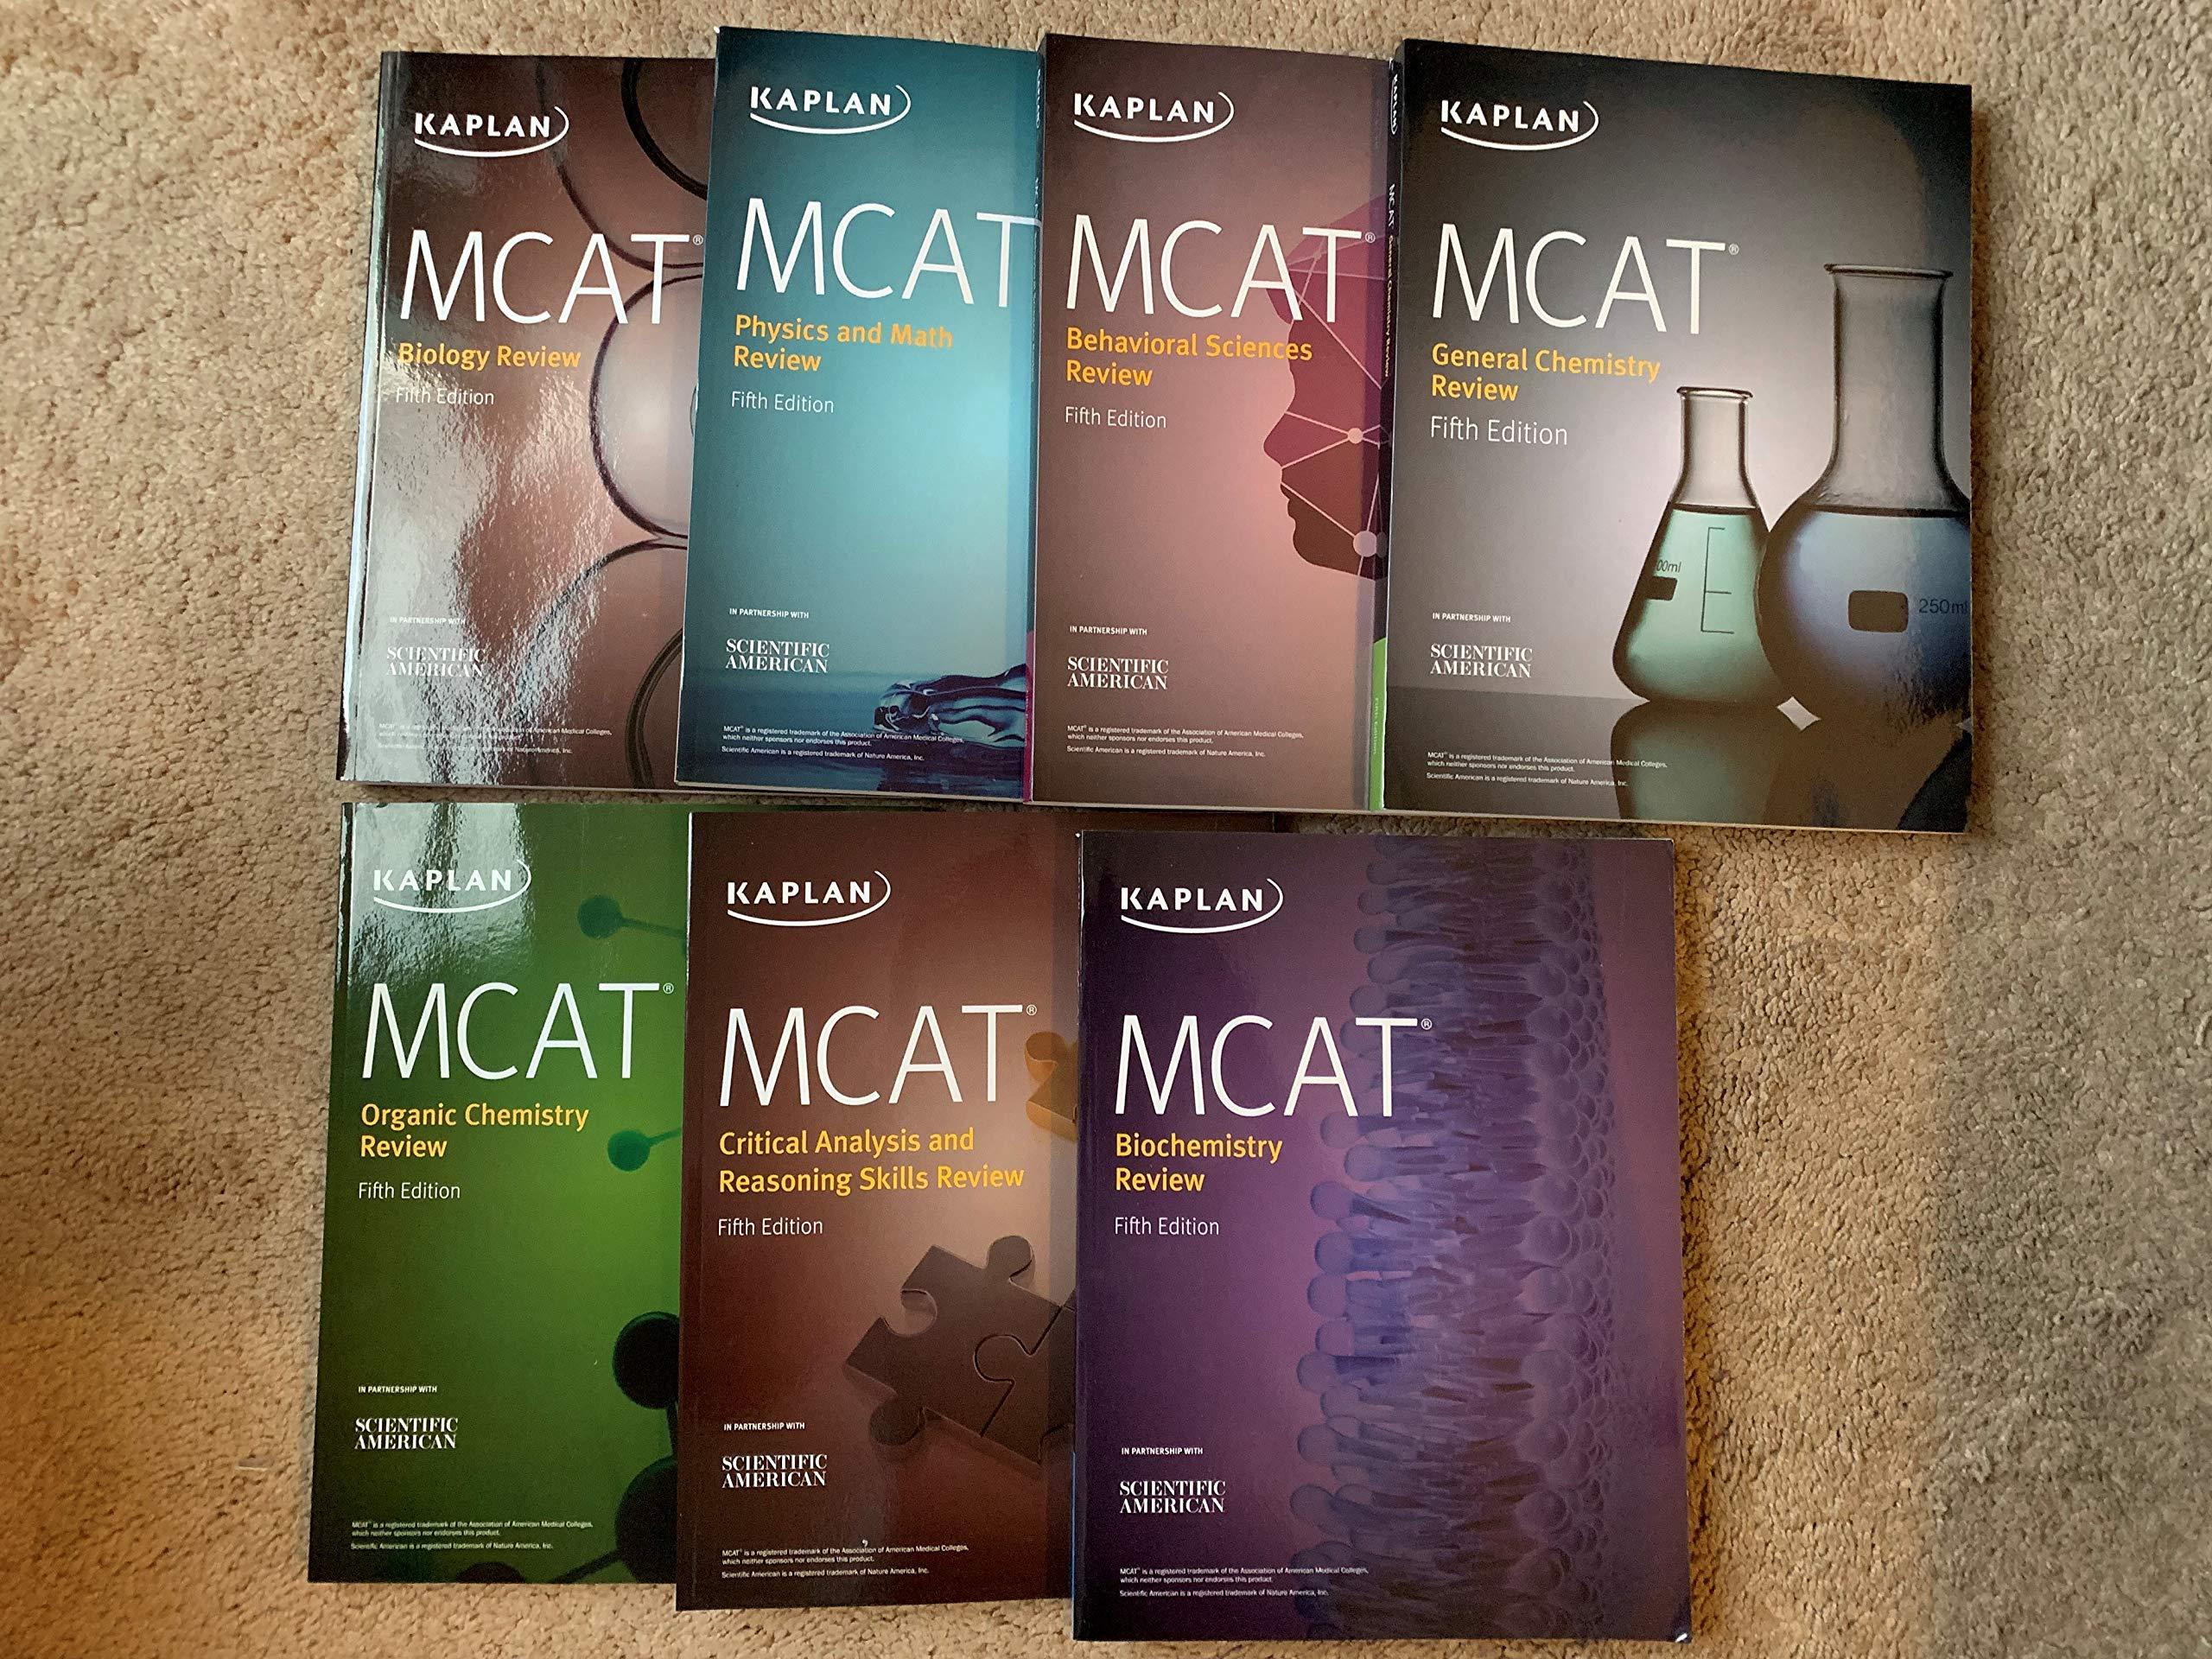 Kaplan Mcat Study Books 5th Edition For New Mcat 7 Books Alexander Stone Macnow Md Kaplan 9781506237770 Amazon Com Books